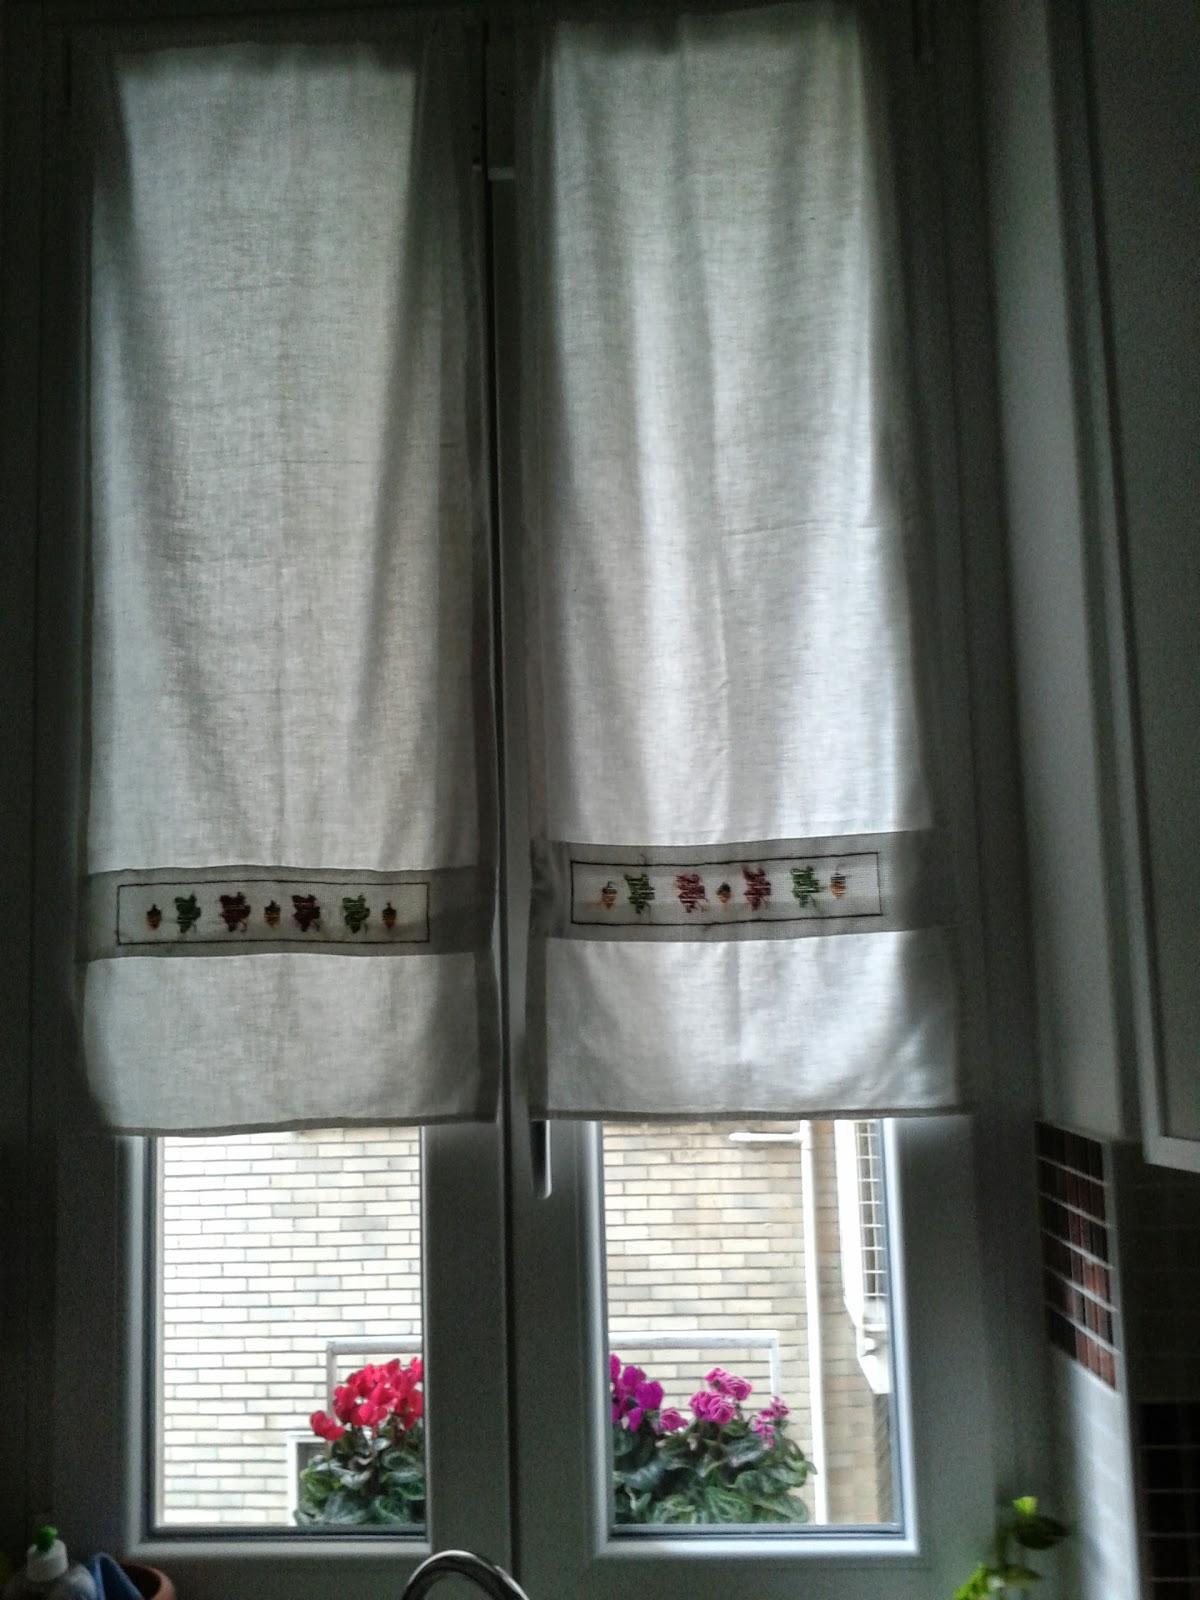 100 metri quadri di mondo tende autunnali - Tende cucina a vetro ...